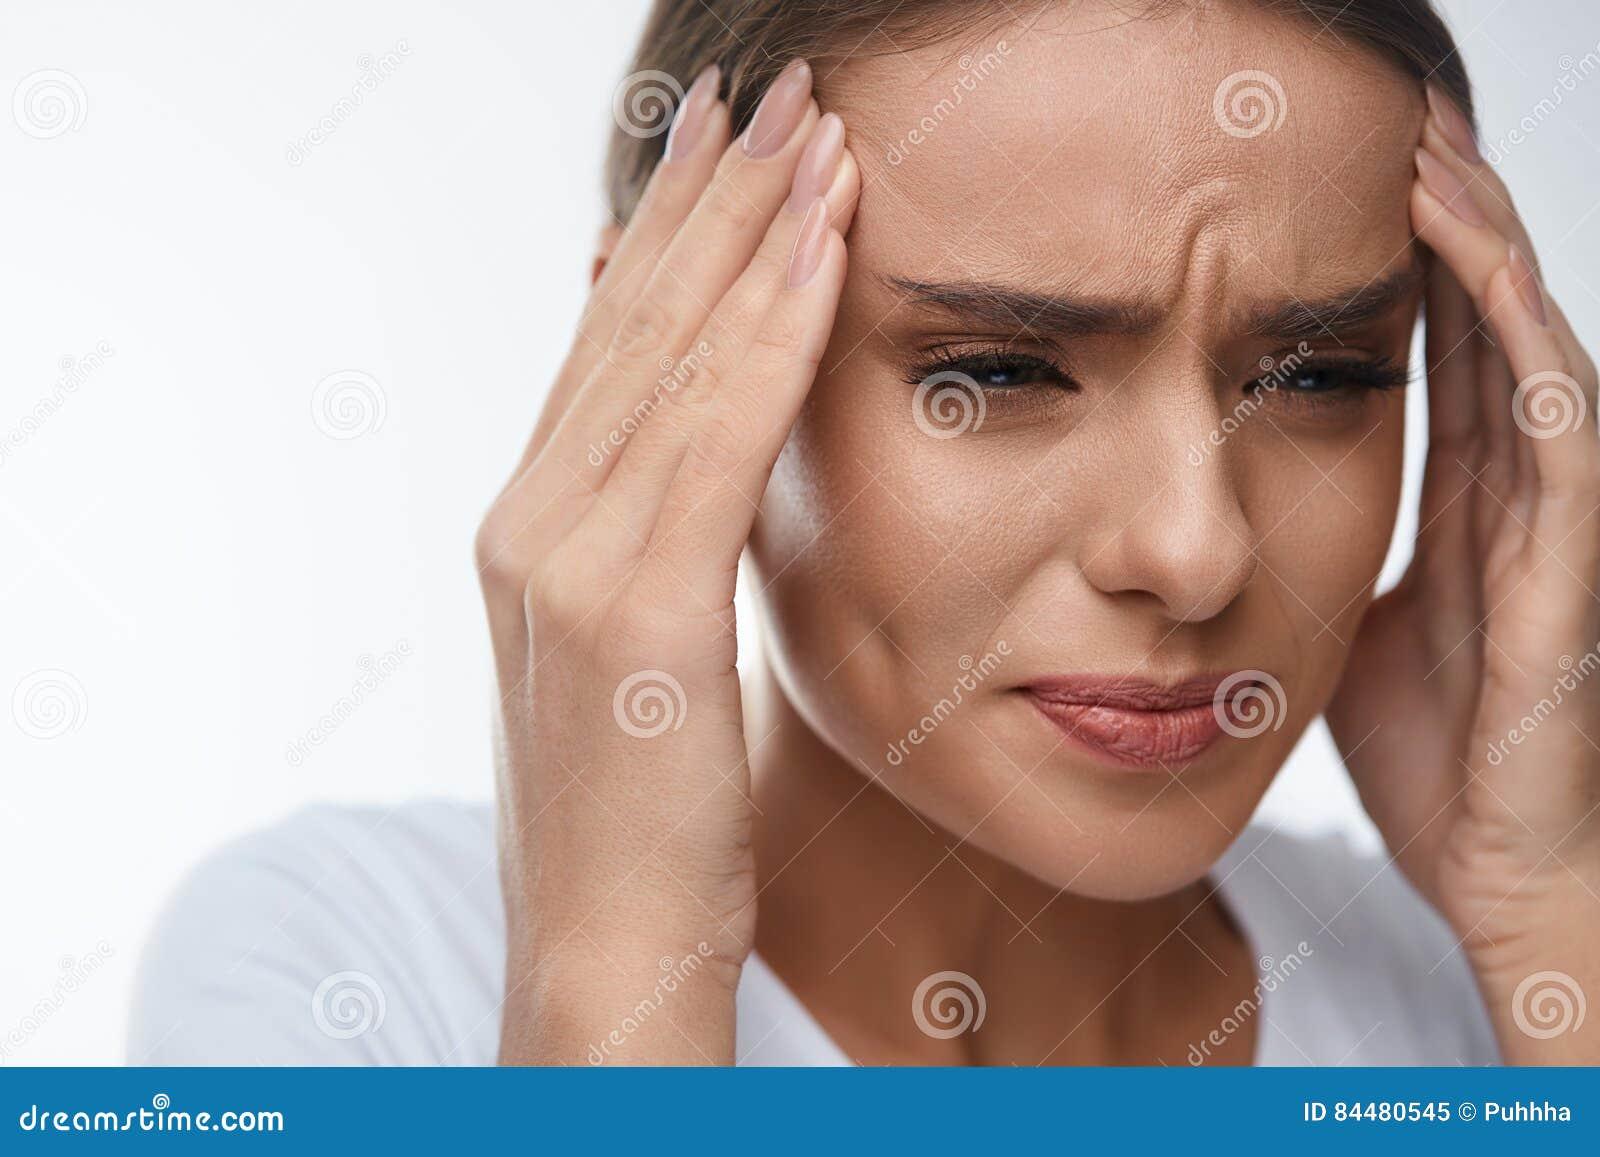 Headache Pain Beautiful Woman Having Painful Migraine Health Stock